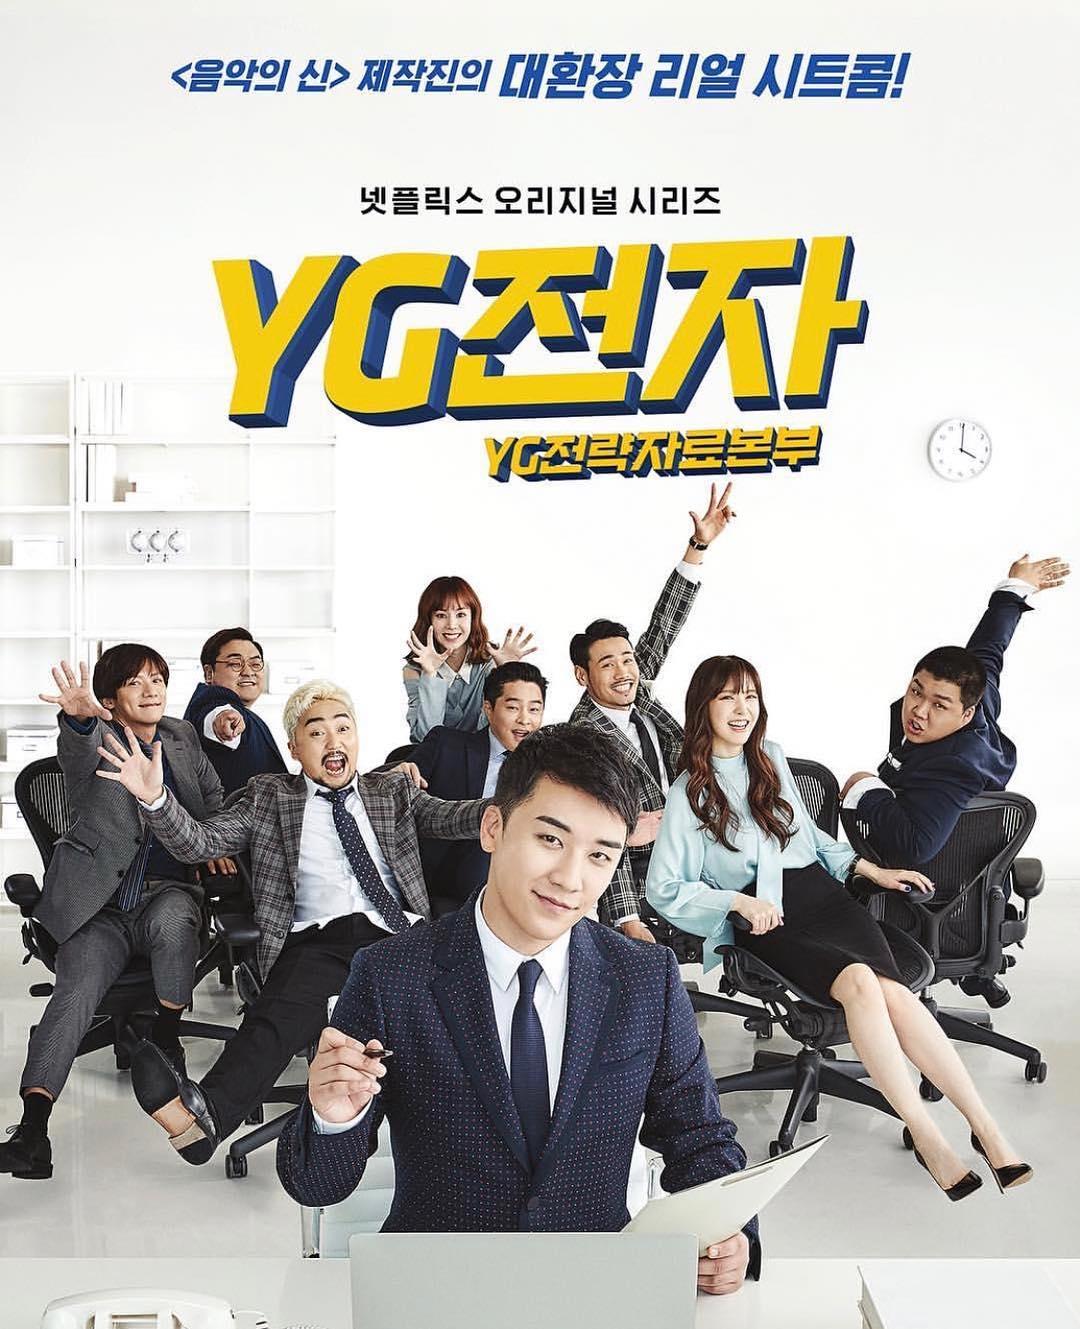 YG最近新推出的喜劇《YG未來策略辦公室》自從節目播出後就爭議十足,在節目中不只充滿許多低級的搞笑戲碼、性騷擾、性犯罪喜劇化等內容,過度嘲弄所屬公司藝人、前所屬公司藝人,也讓部分觀眾展開「抵制運動」